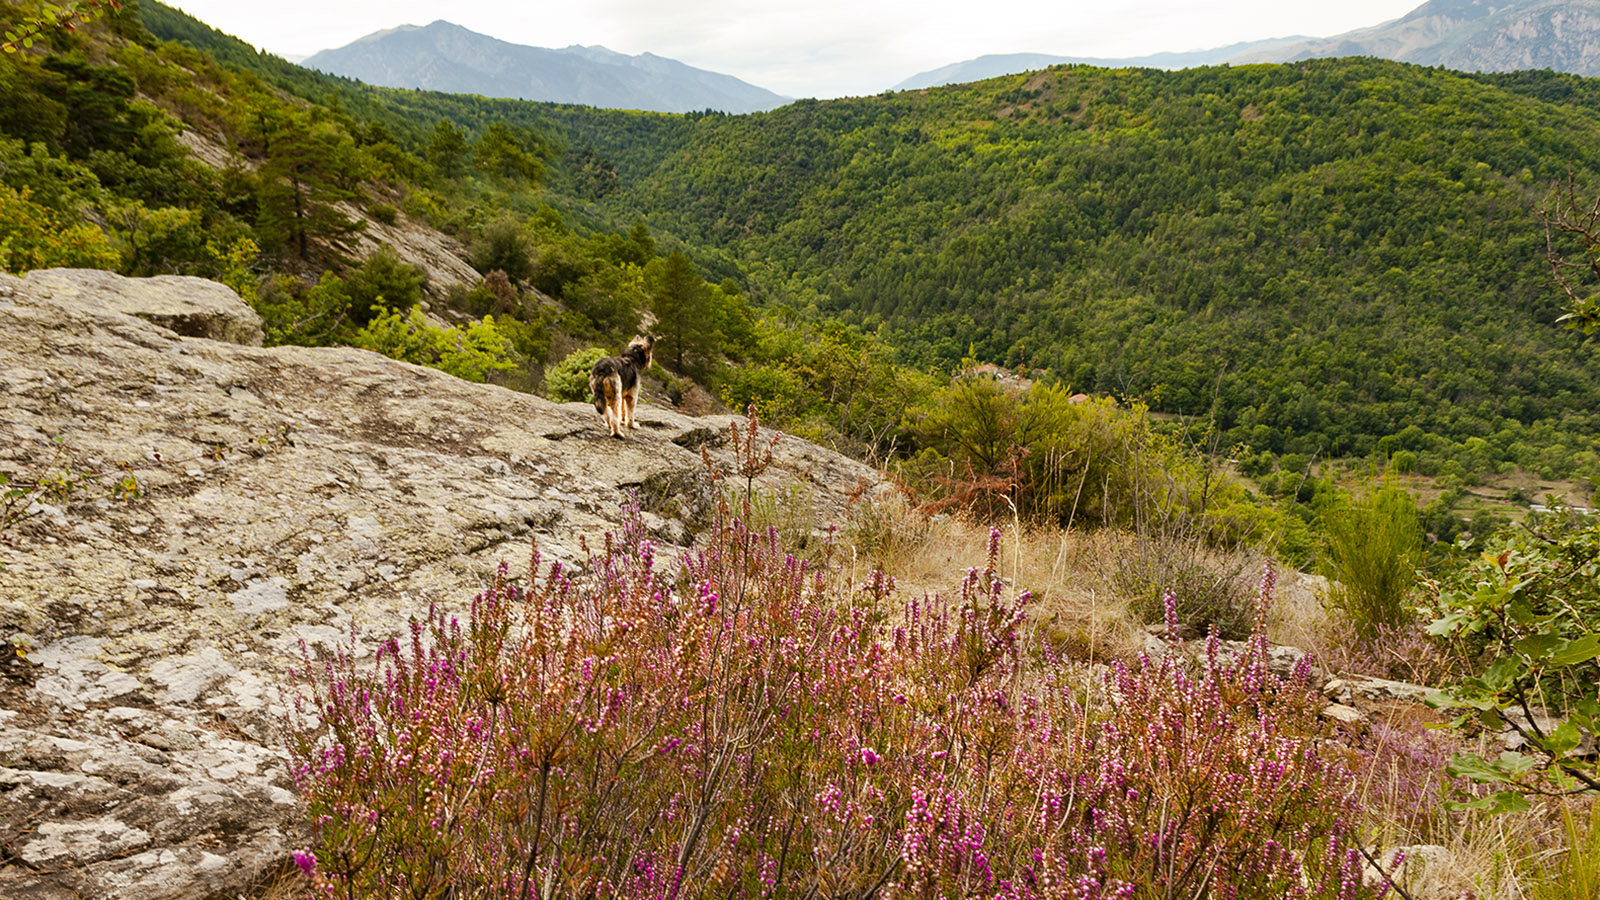 Canigó: Im Herbst blüht die Heide (bruyère). Foto: Hilke Maunder